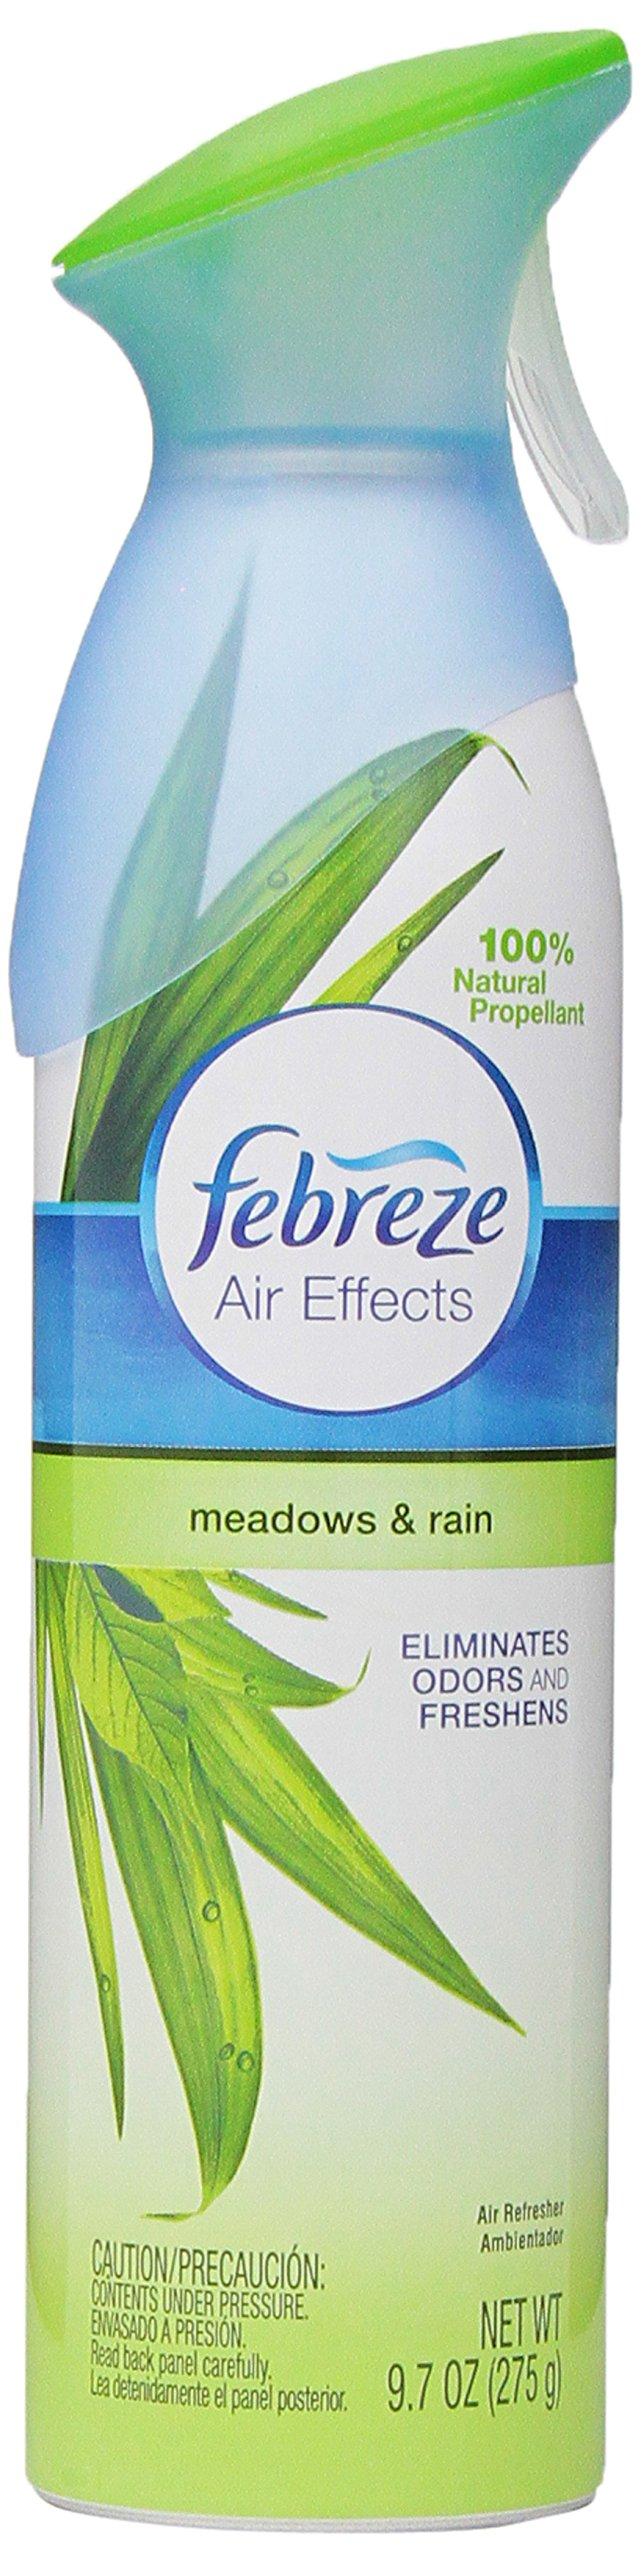 Febreze Air Freshener, Air Effects Meadows & Rain Air Freshener (9.7 Oz) (Pack of 9)